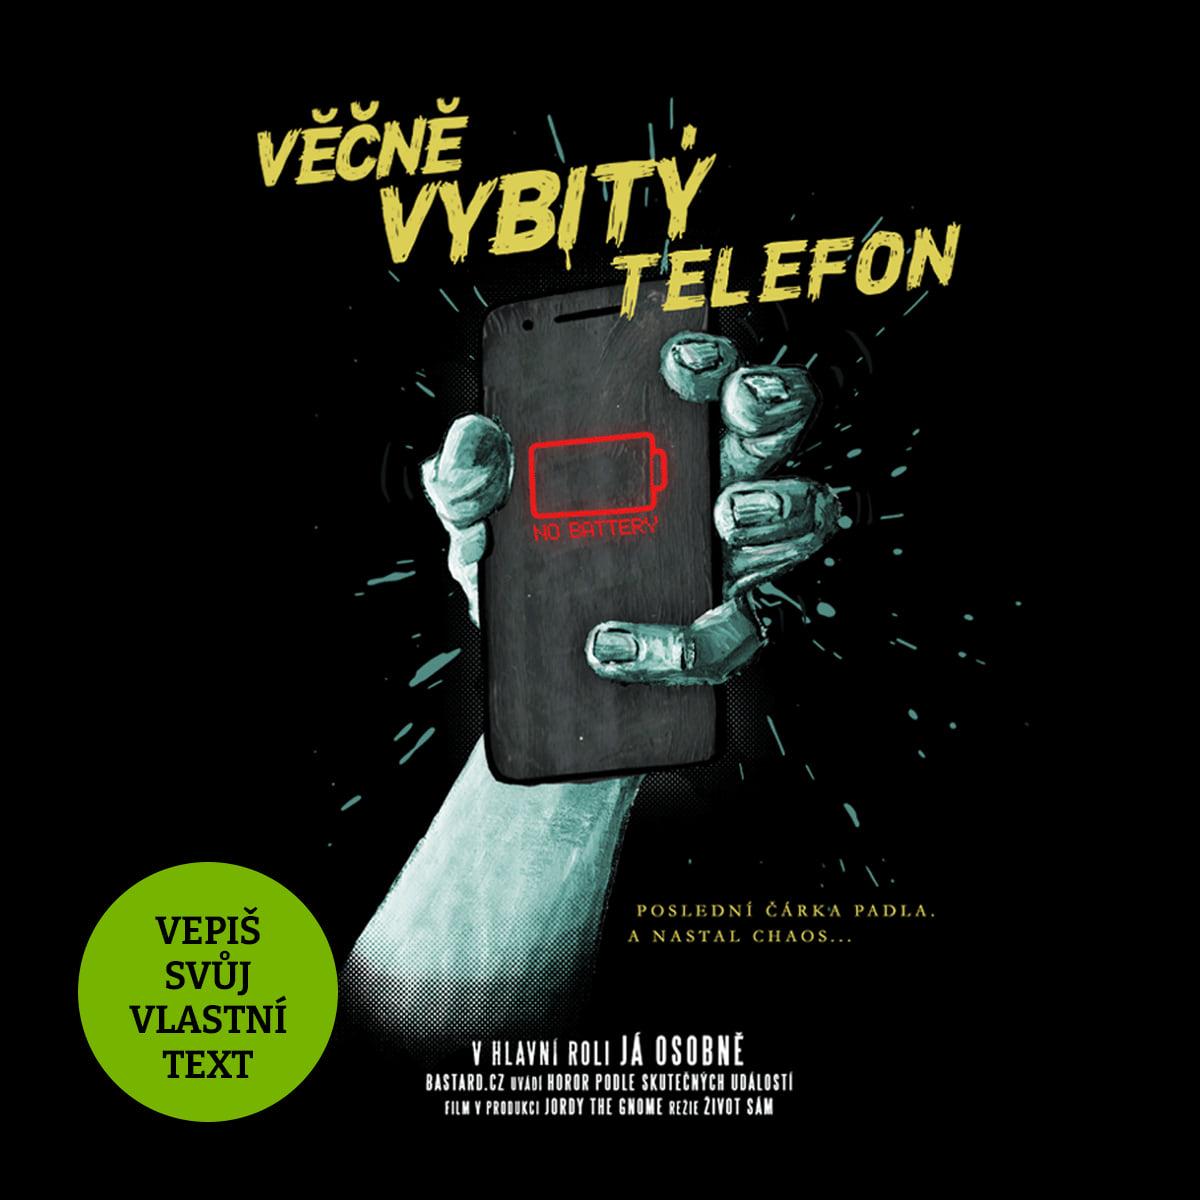 B13: Vybitý telefon